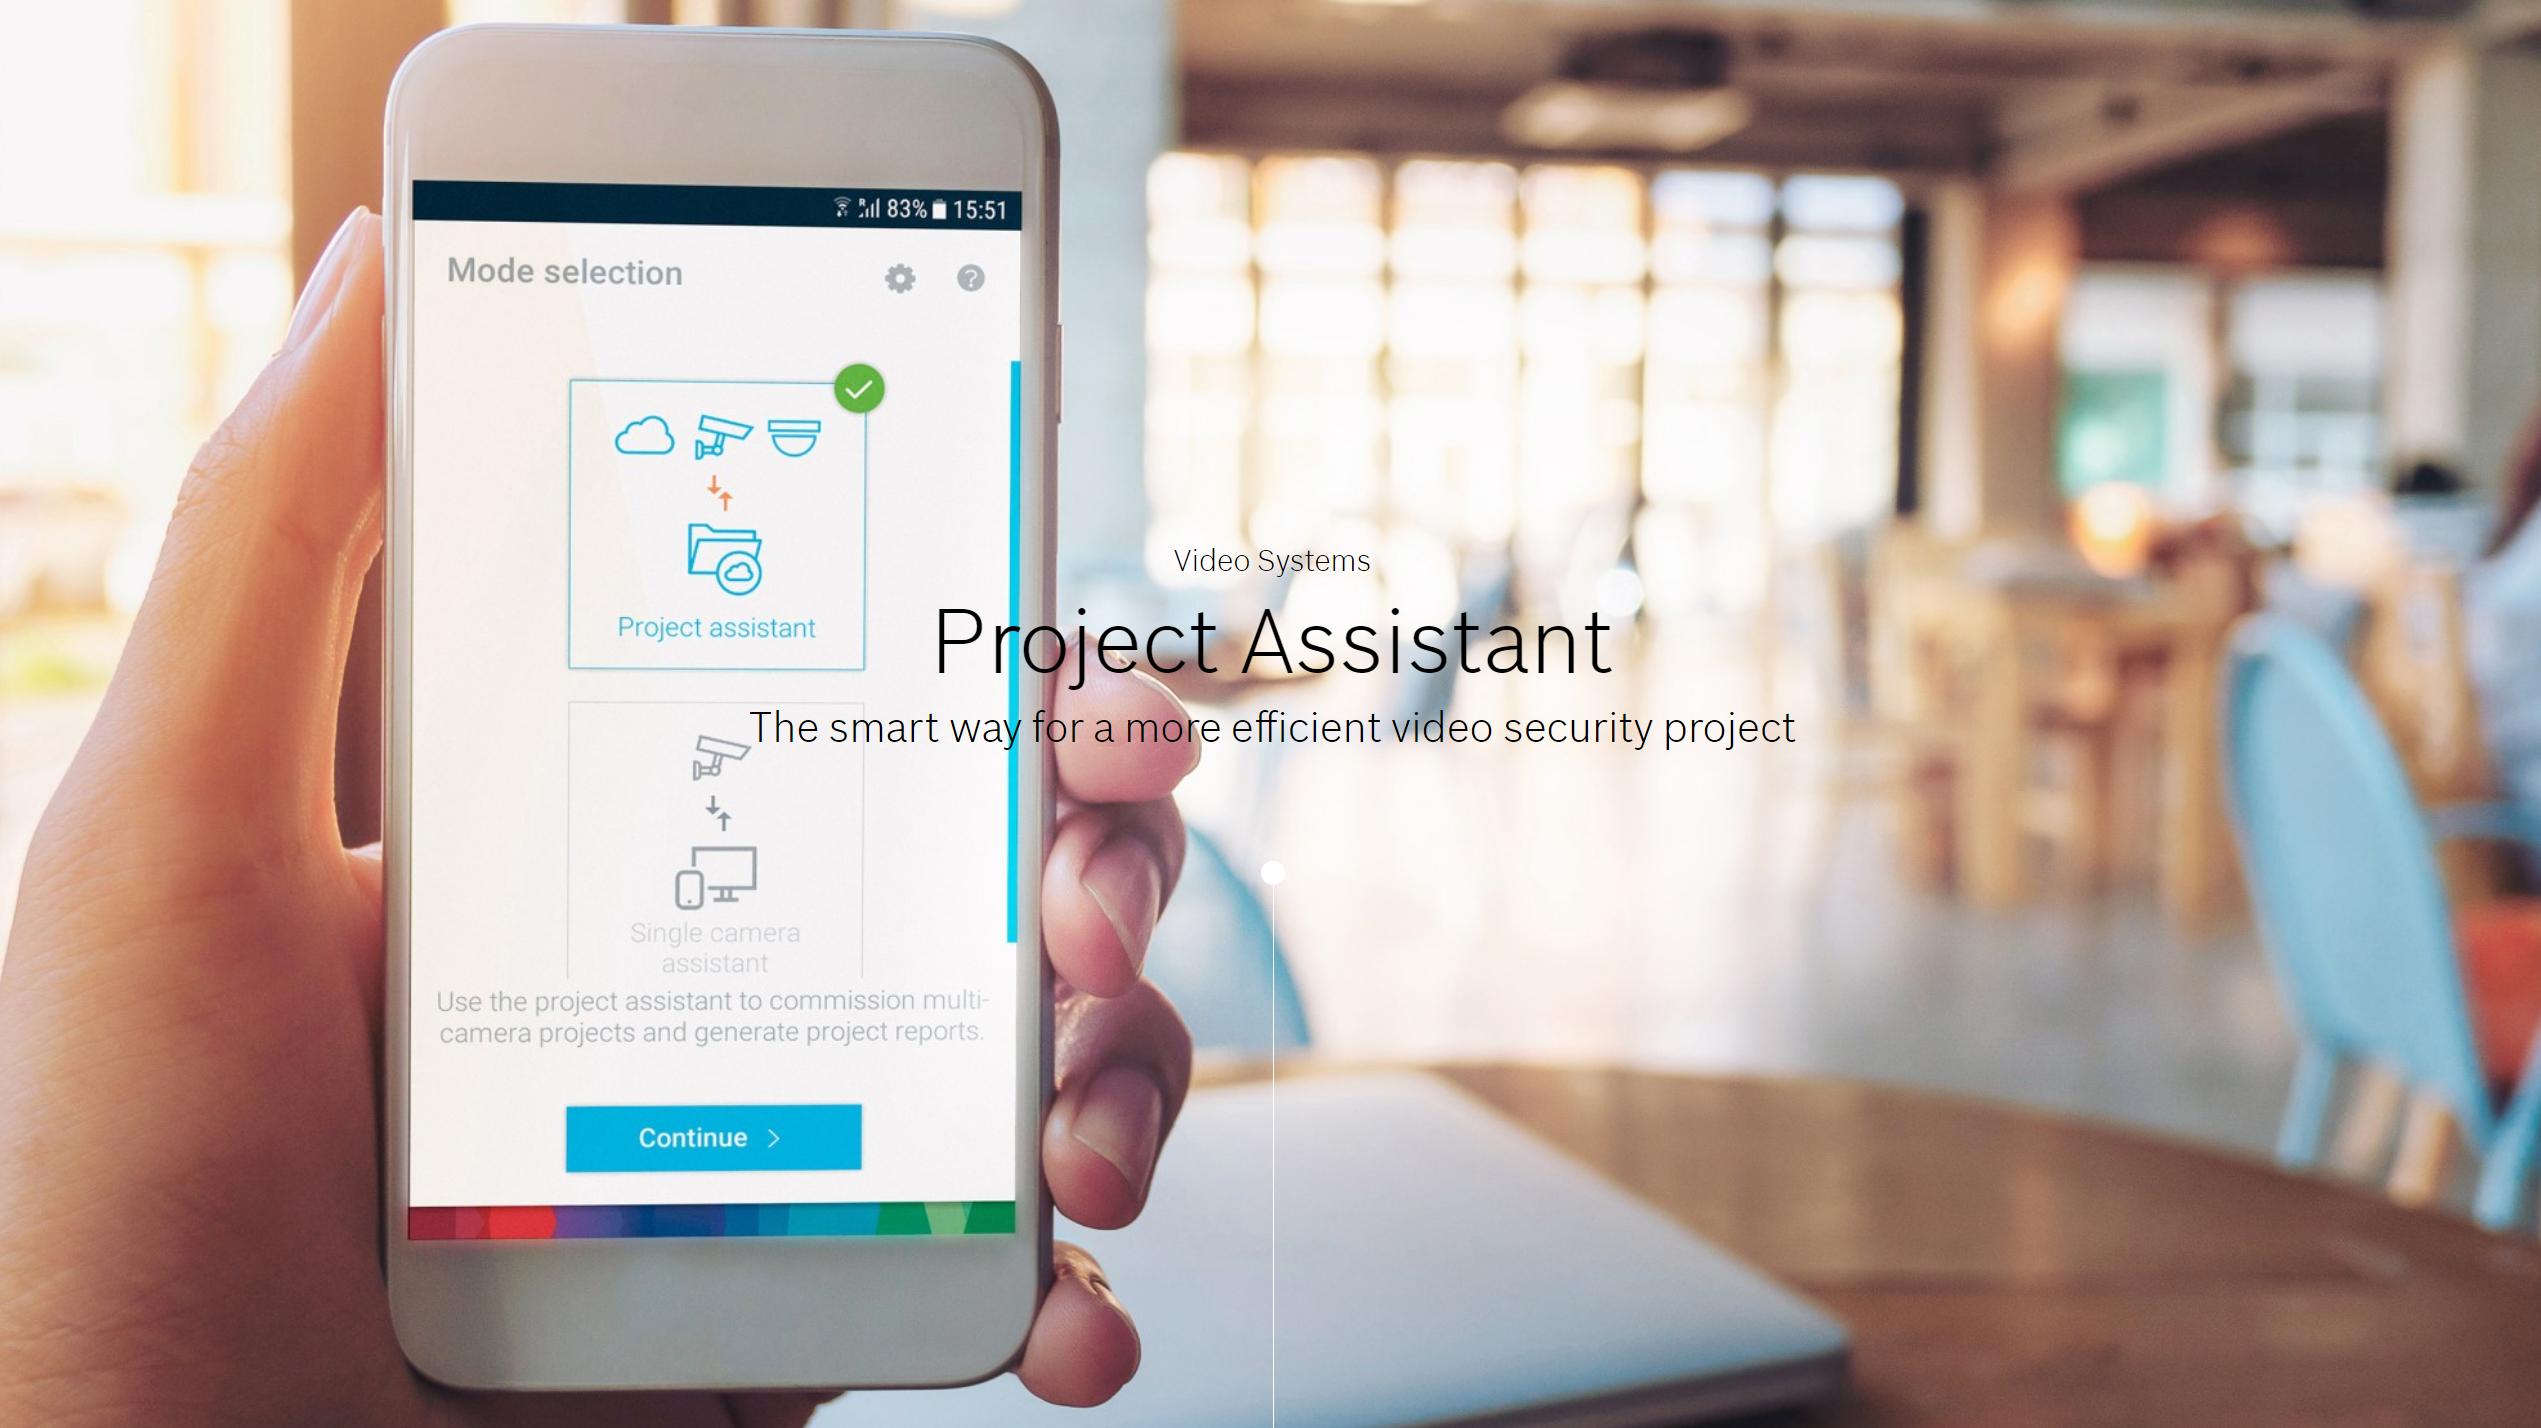 Bosch Project Assistant web image